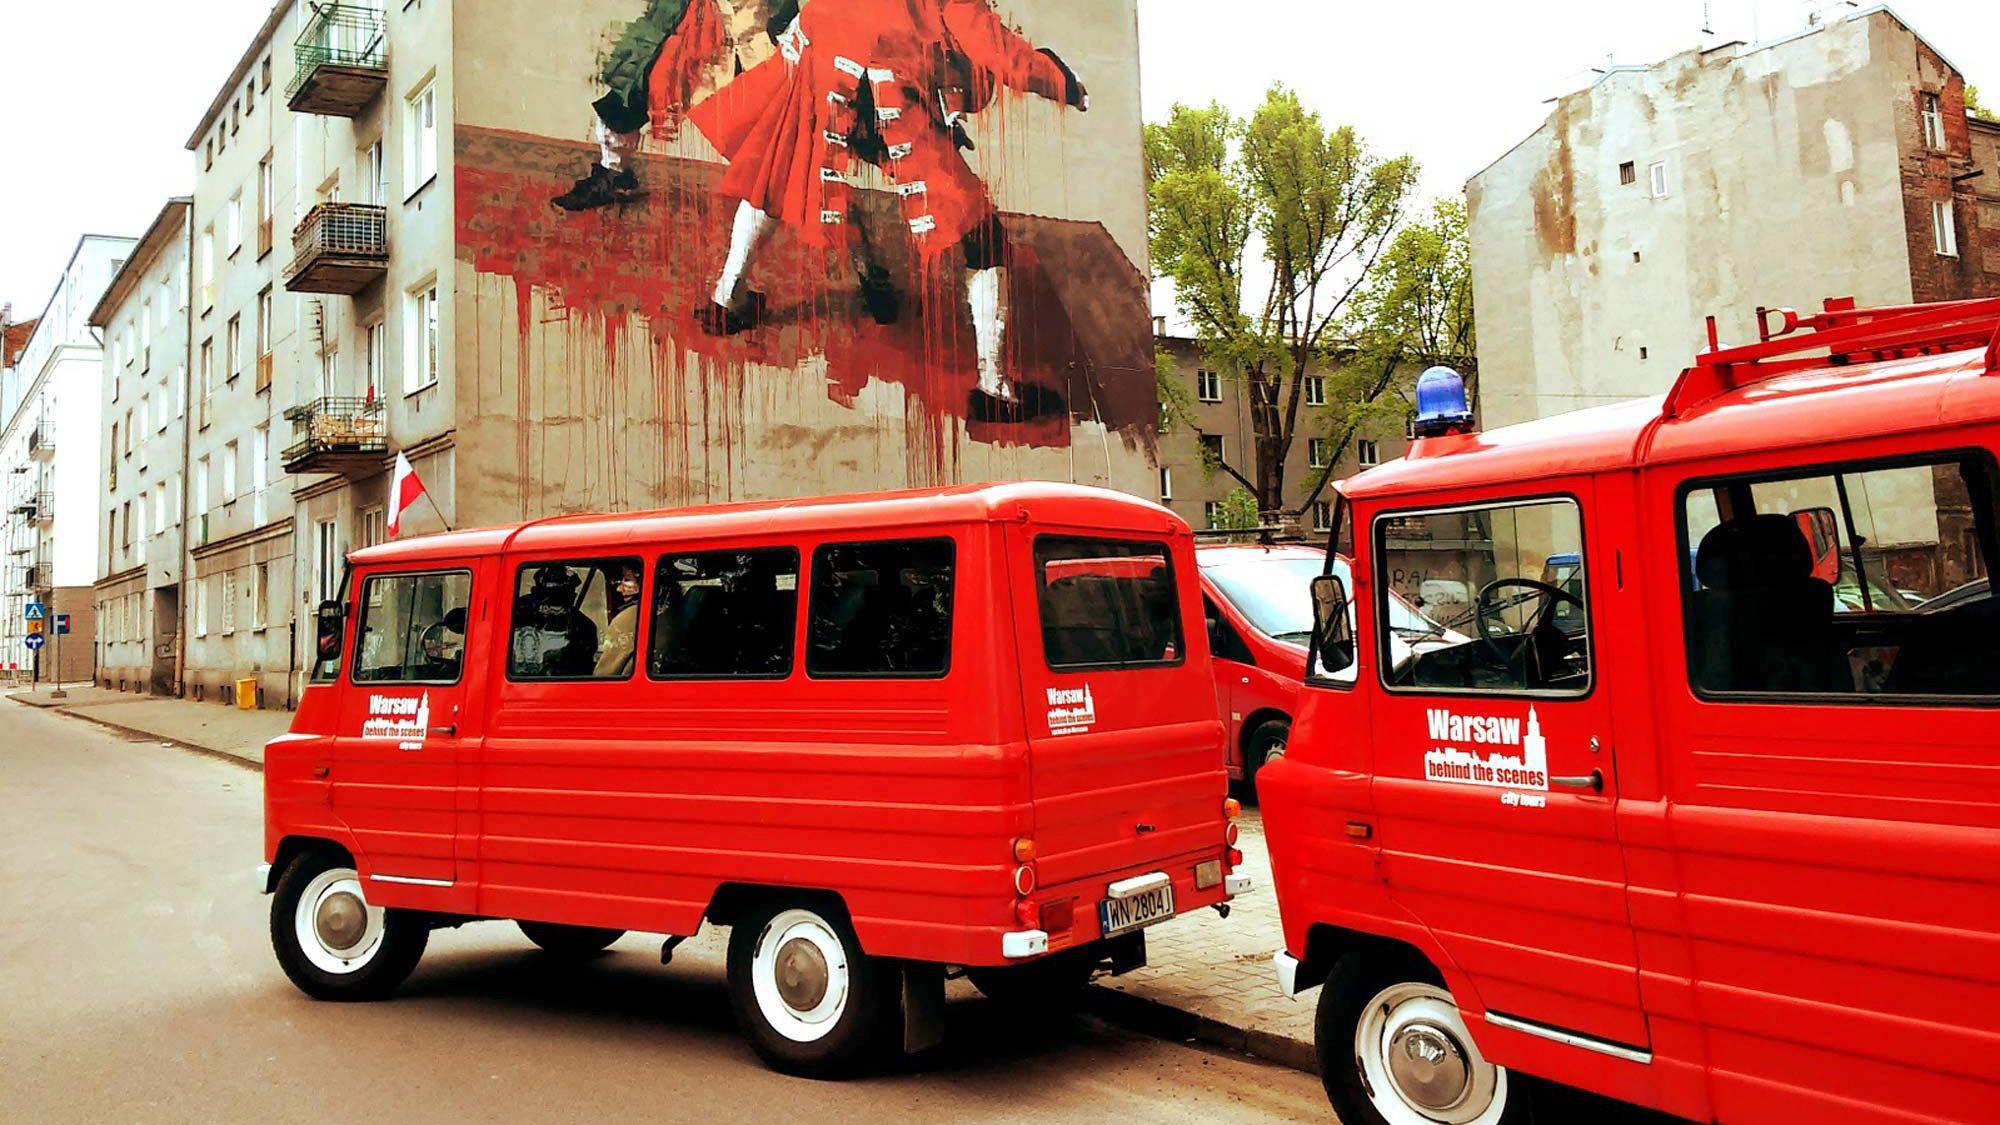 Warszawa: Fire timers tur i en gamme minibuss bak kulissene i byen